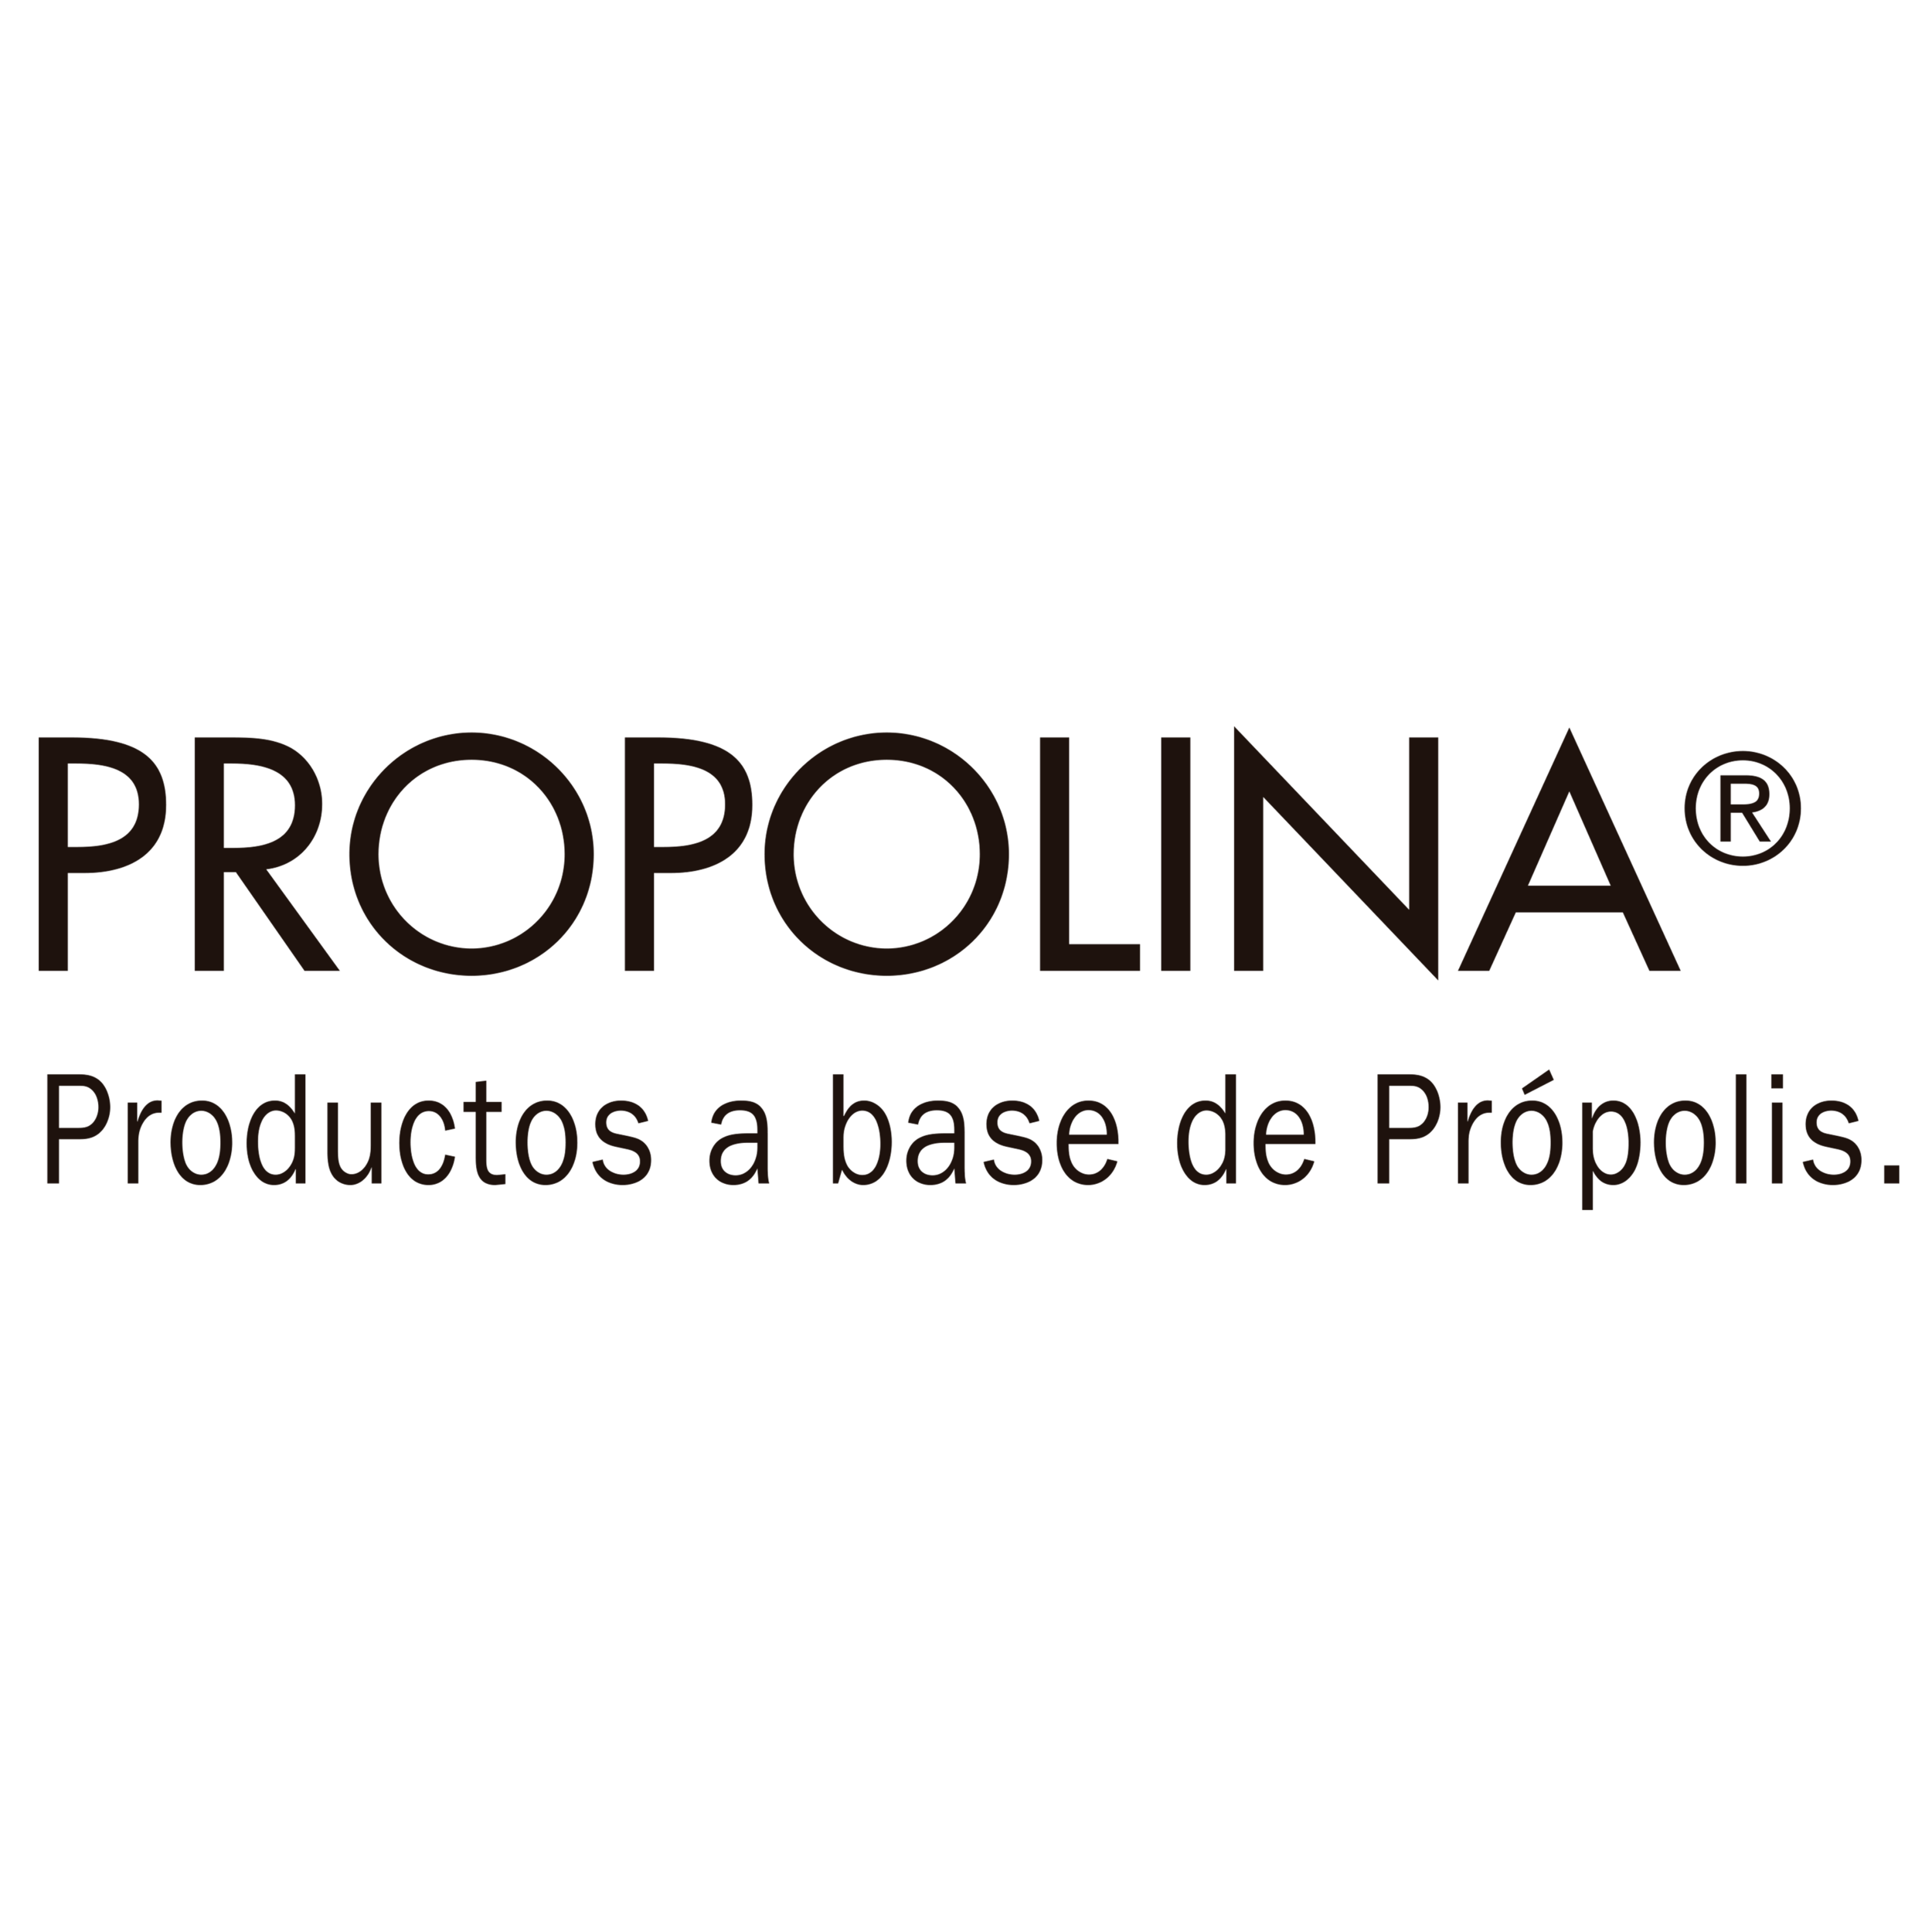 Propolina